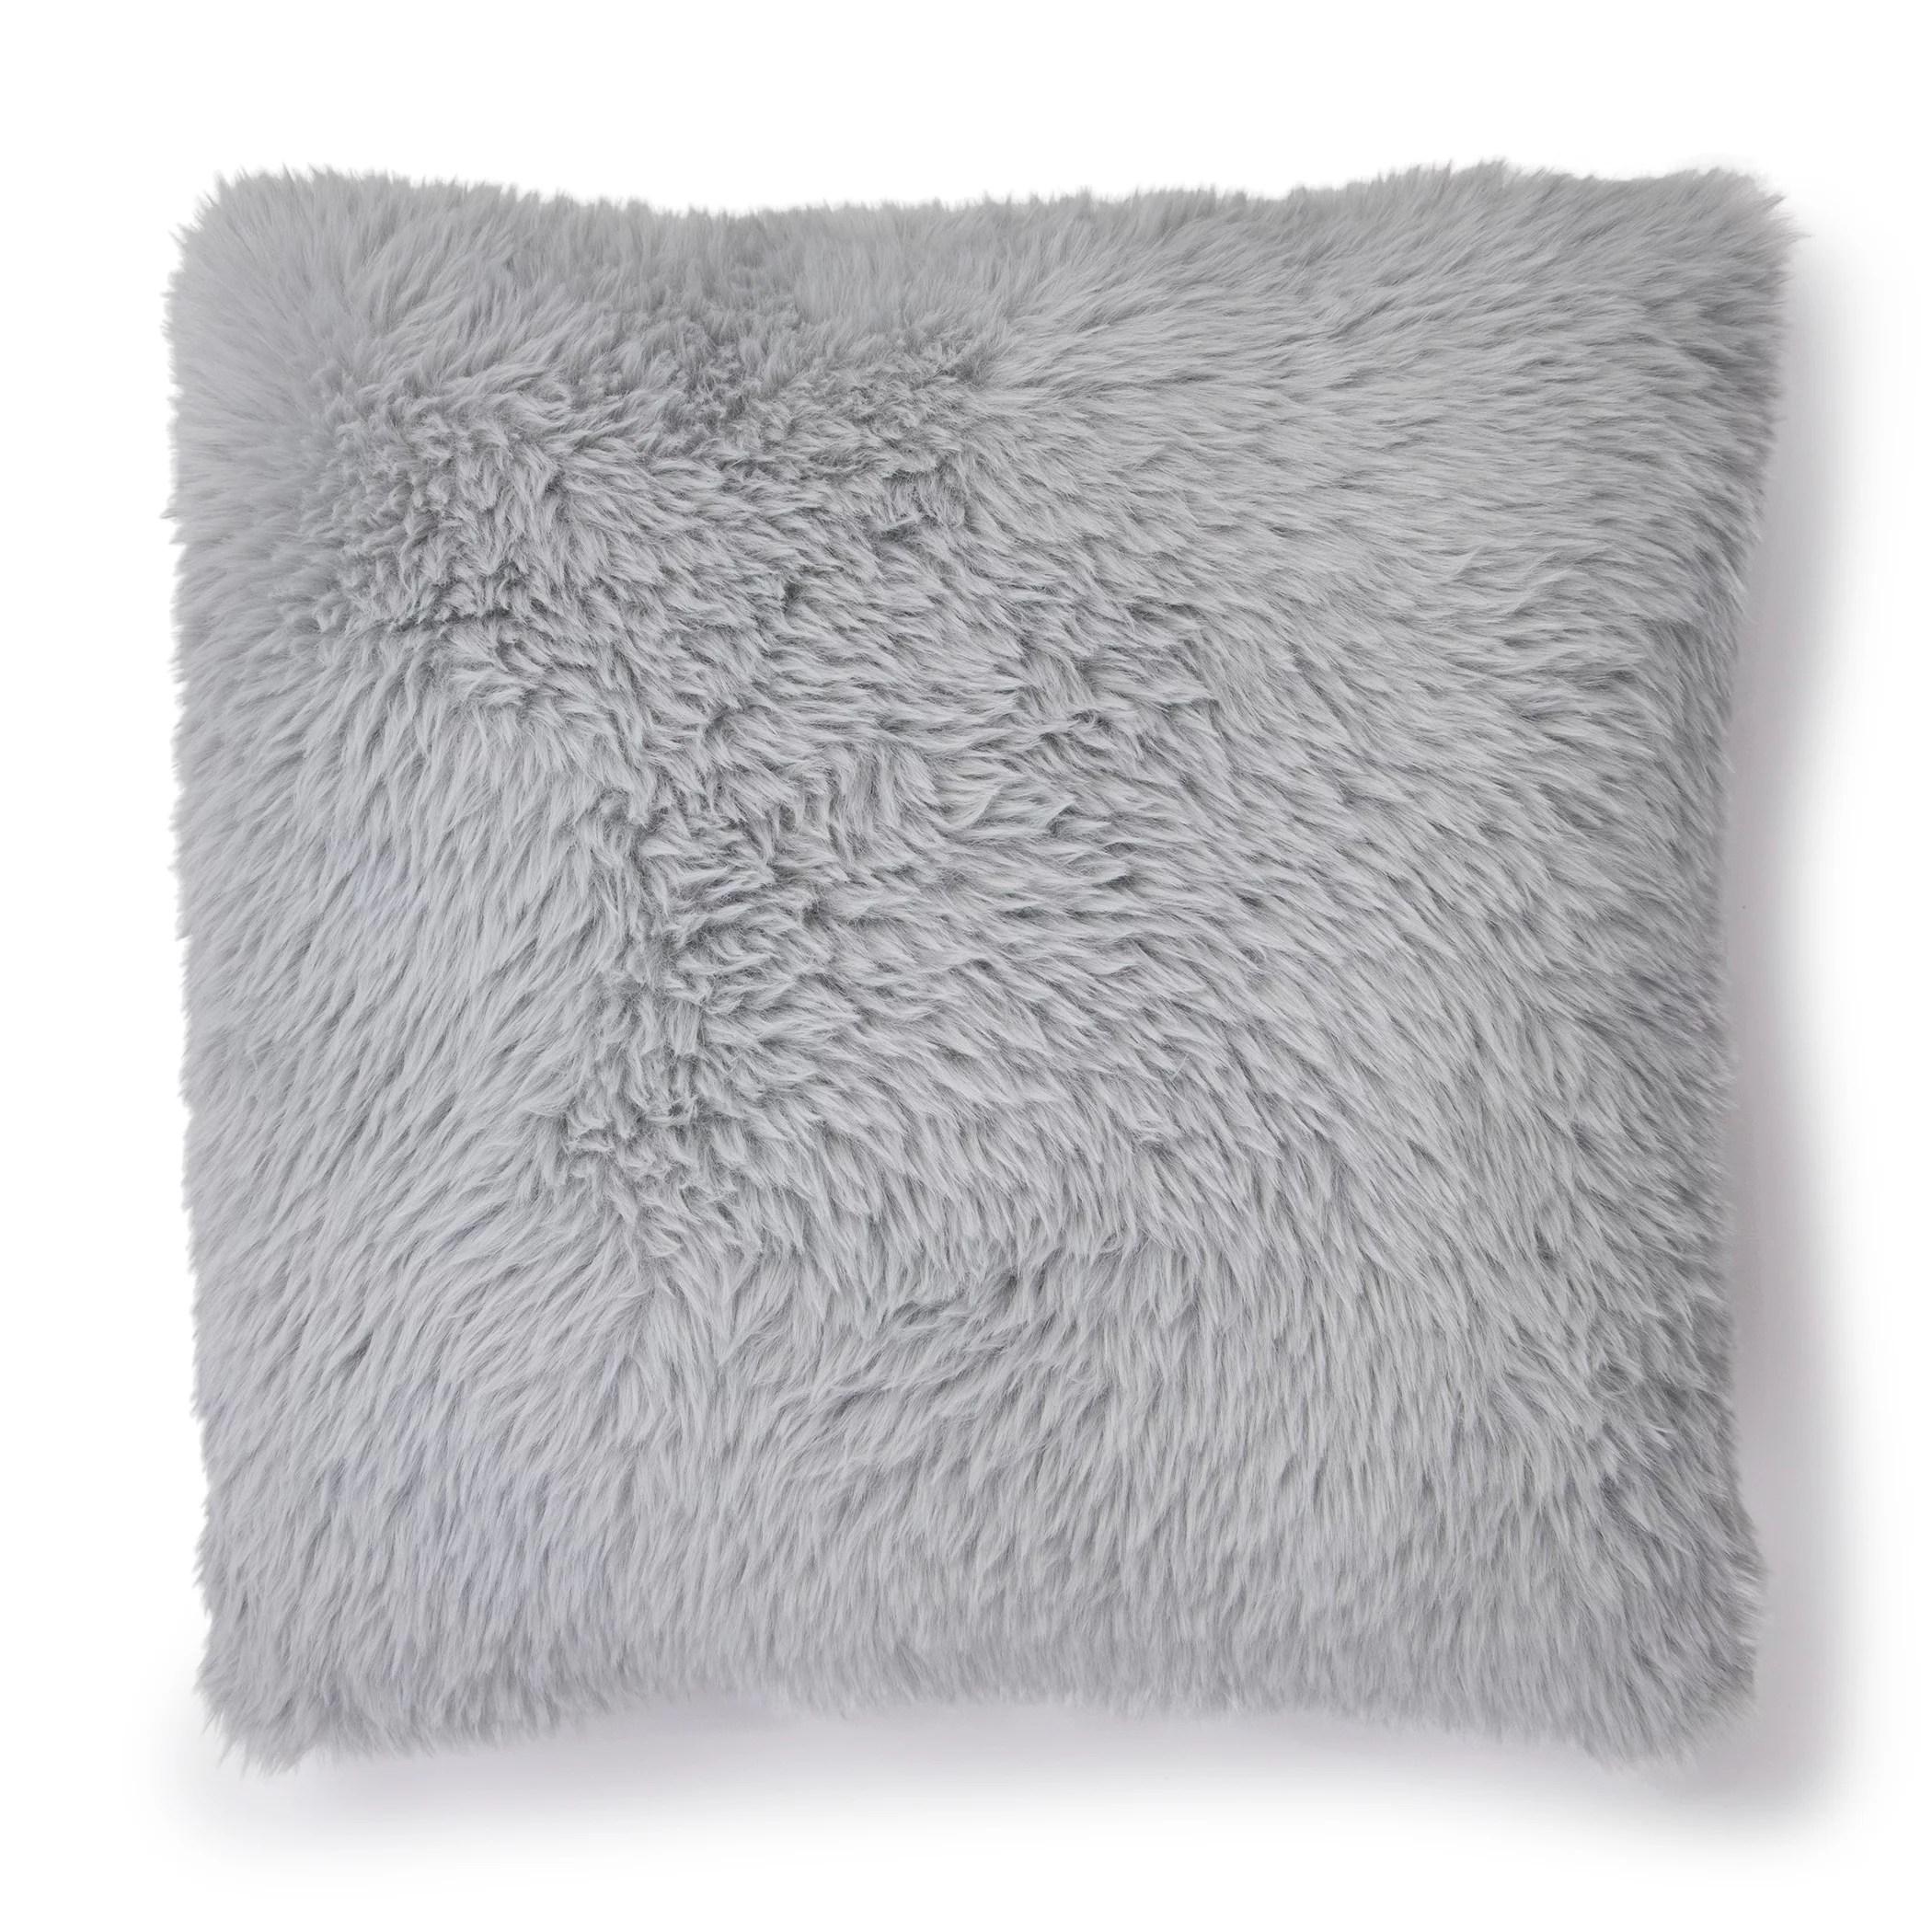 mainstays rabbit fur decorative throw pillow 20 x 20 square gray walmart com